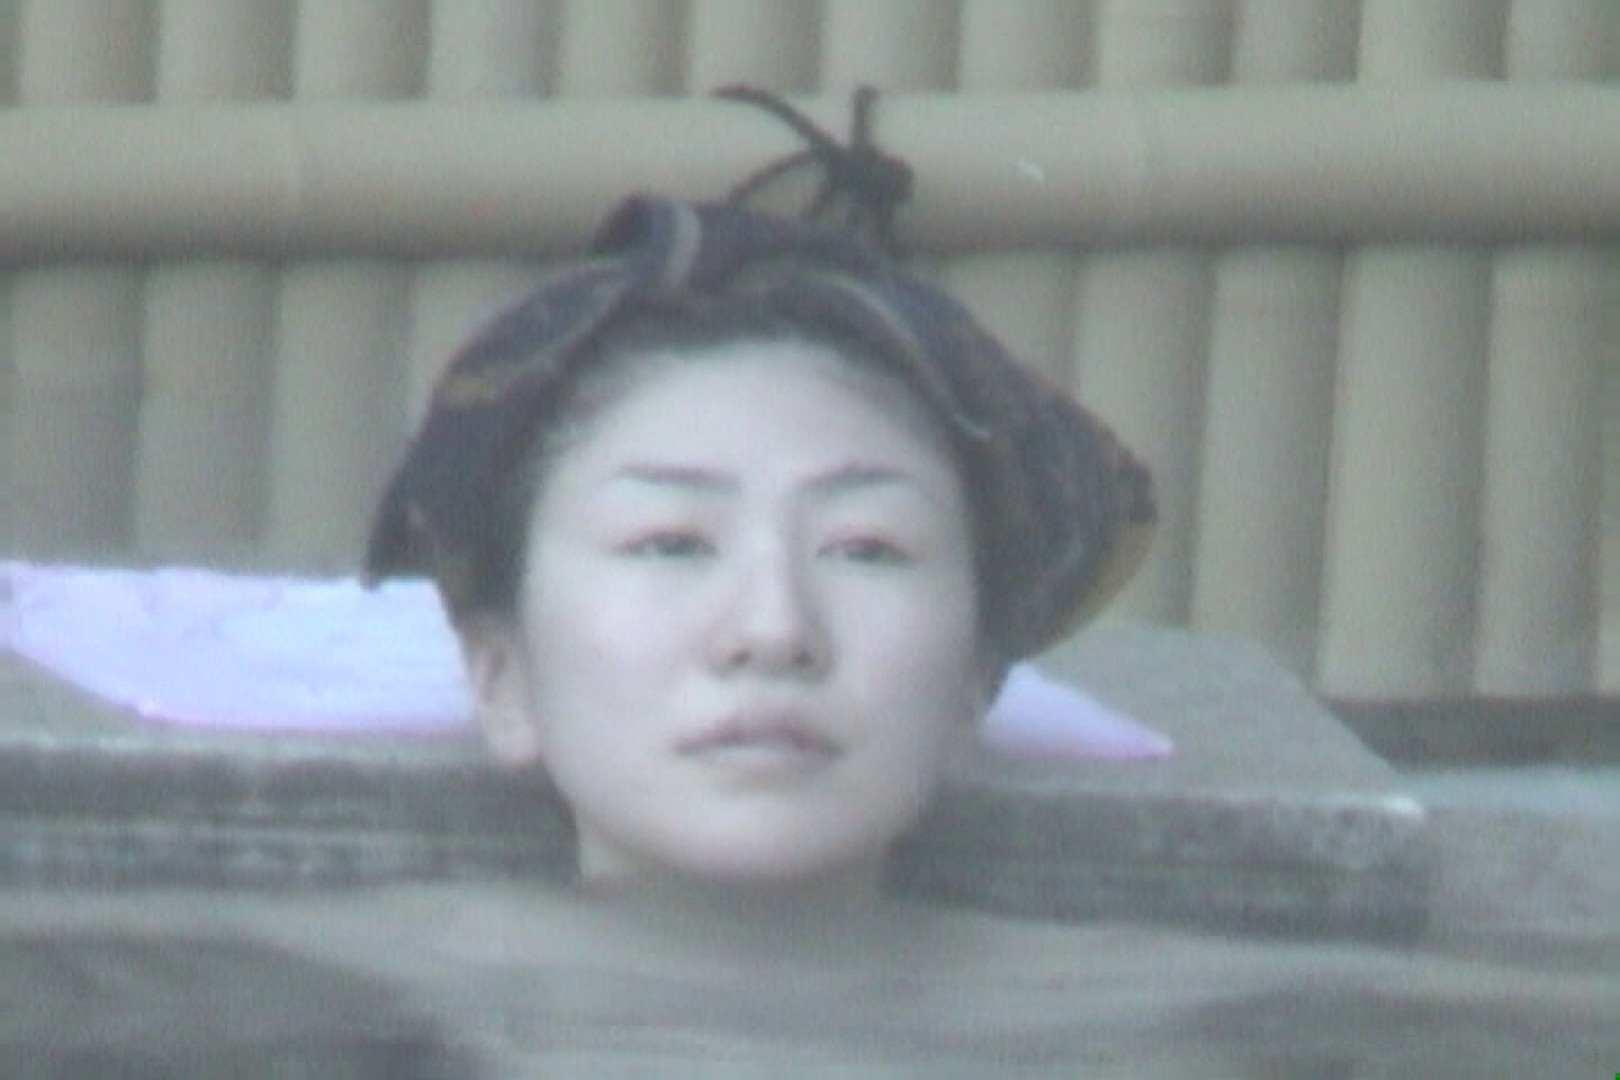 Aquaな露天風呂Vol.607 盗撮シリーズ | 露天風呂編  107PIX 99